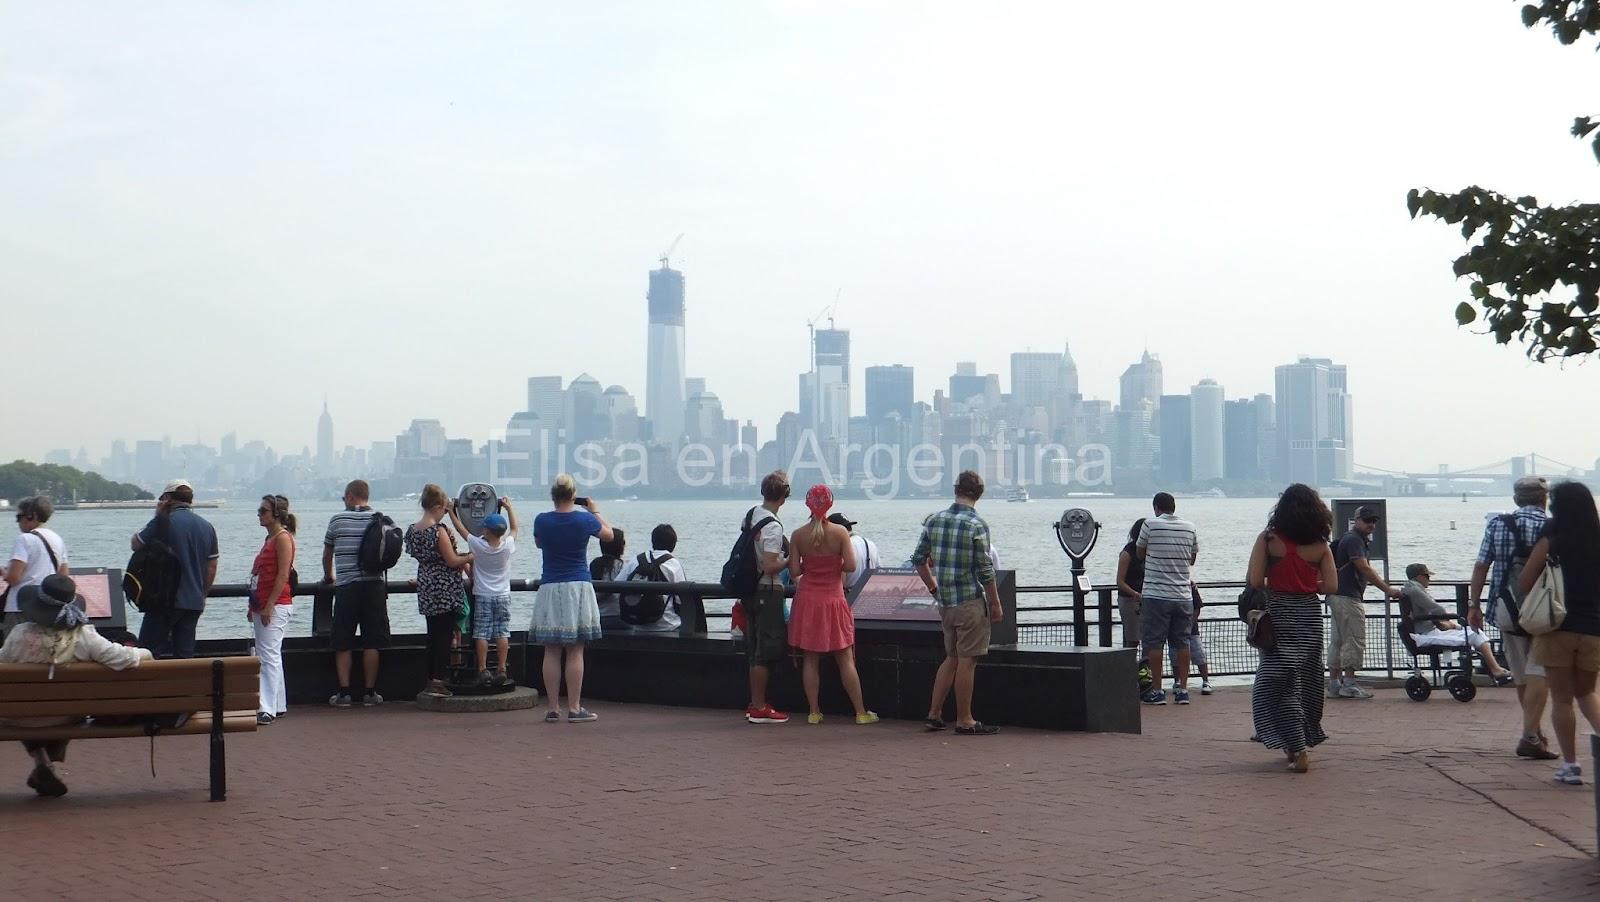 Estatua de la Libertad, Lady Liberty, Liberty Island, New York, Elisa N, Blog de Viajes, Lifestyle, Travel